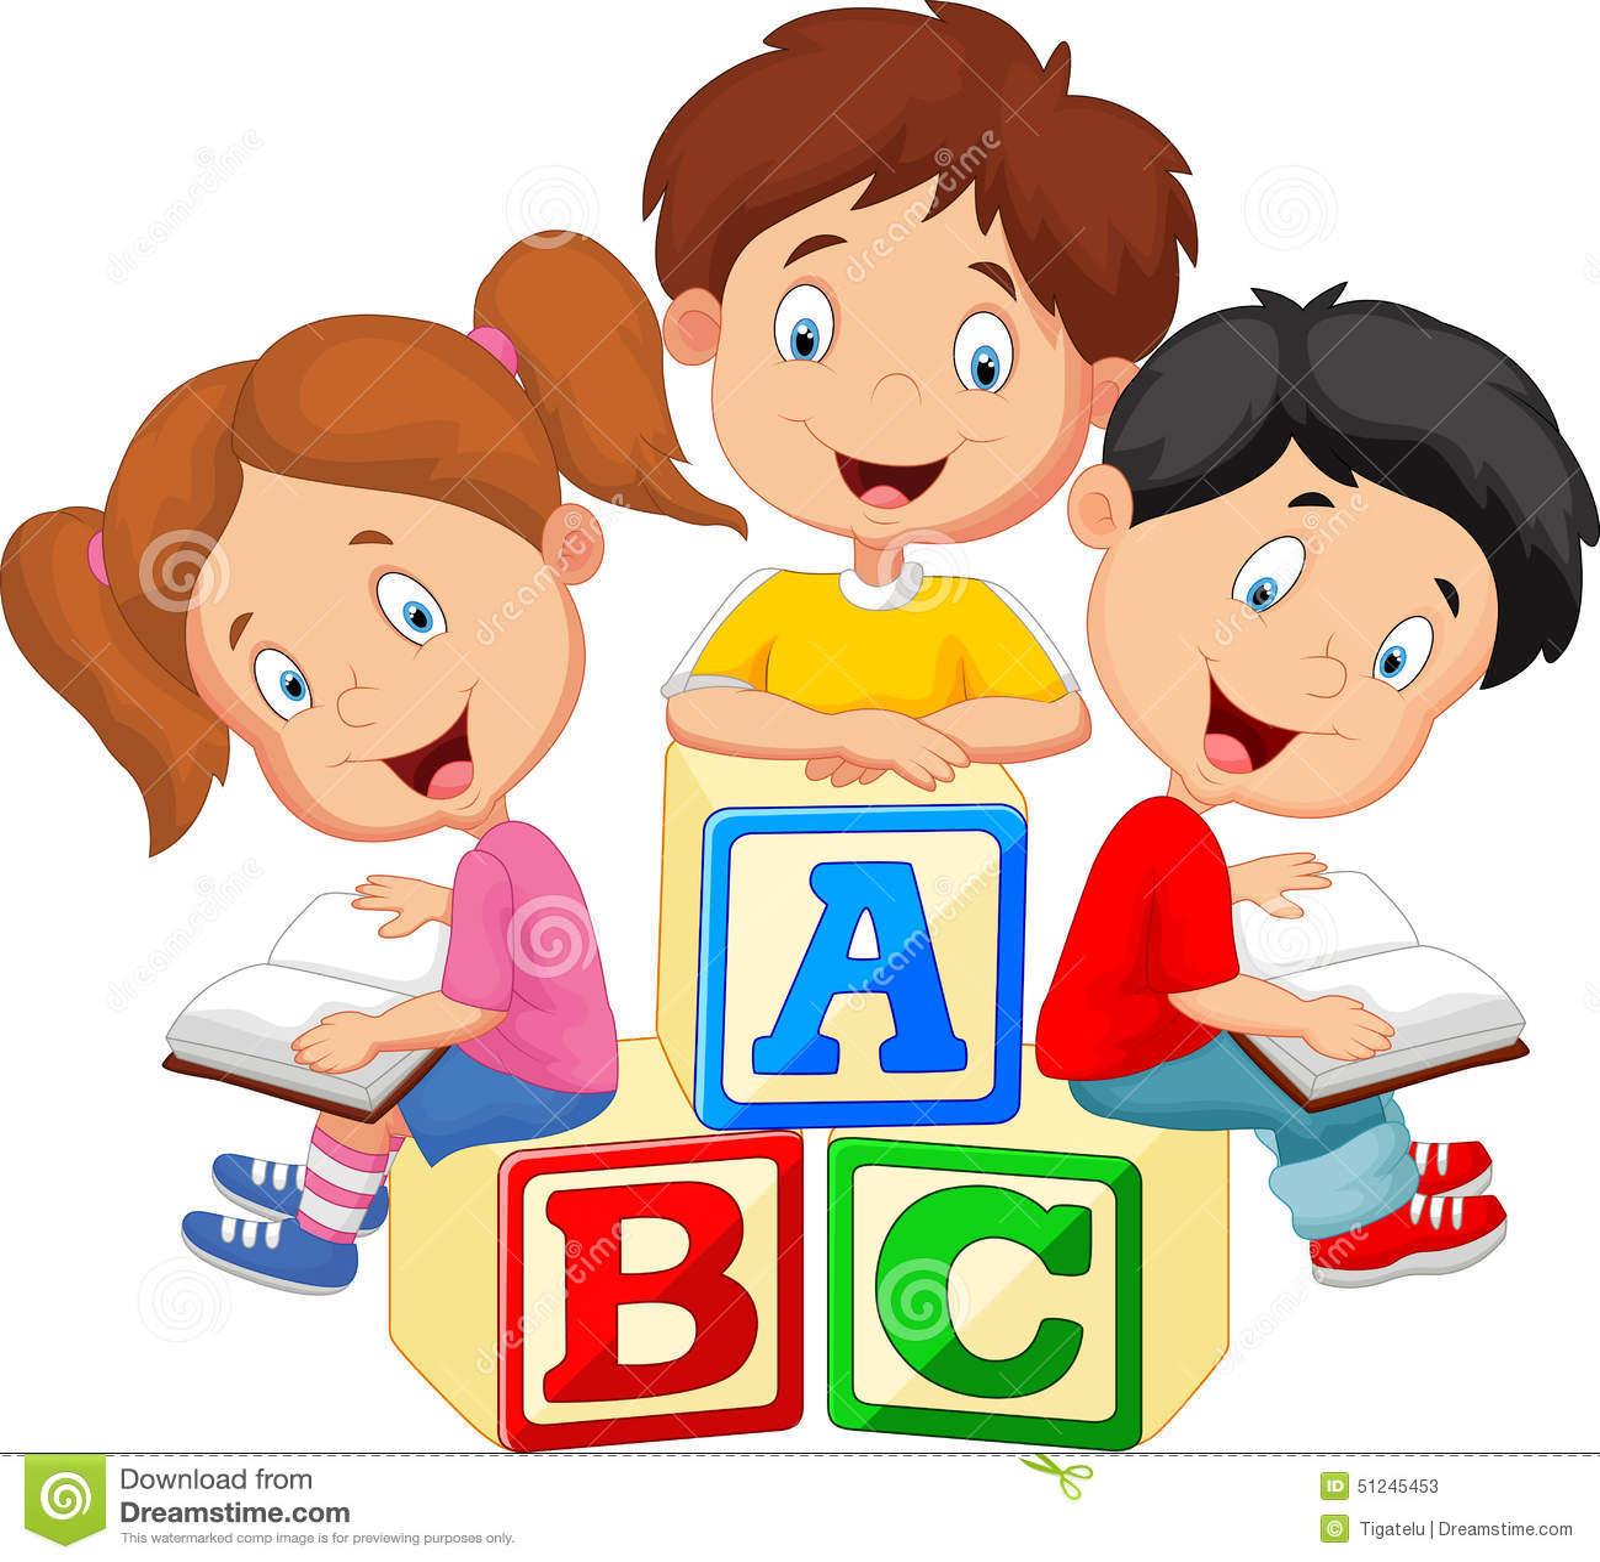 reading book and sitting on alphabet blocks mr no pr no 5 6749 45